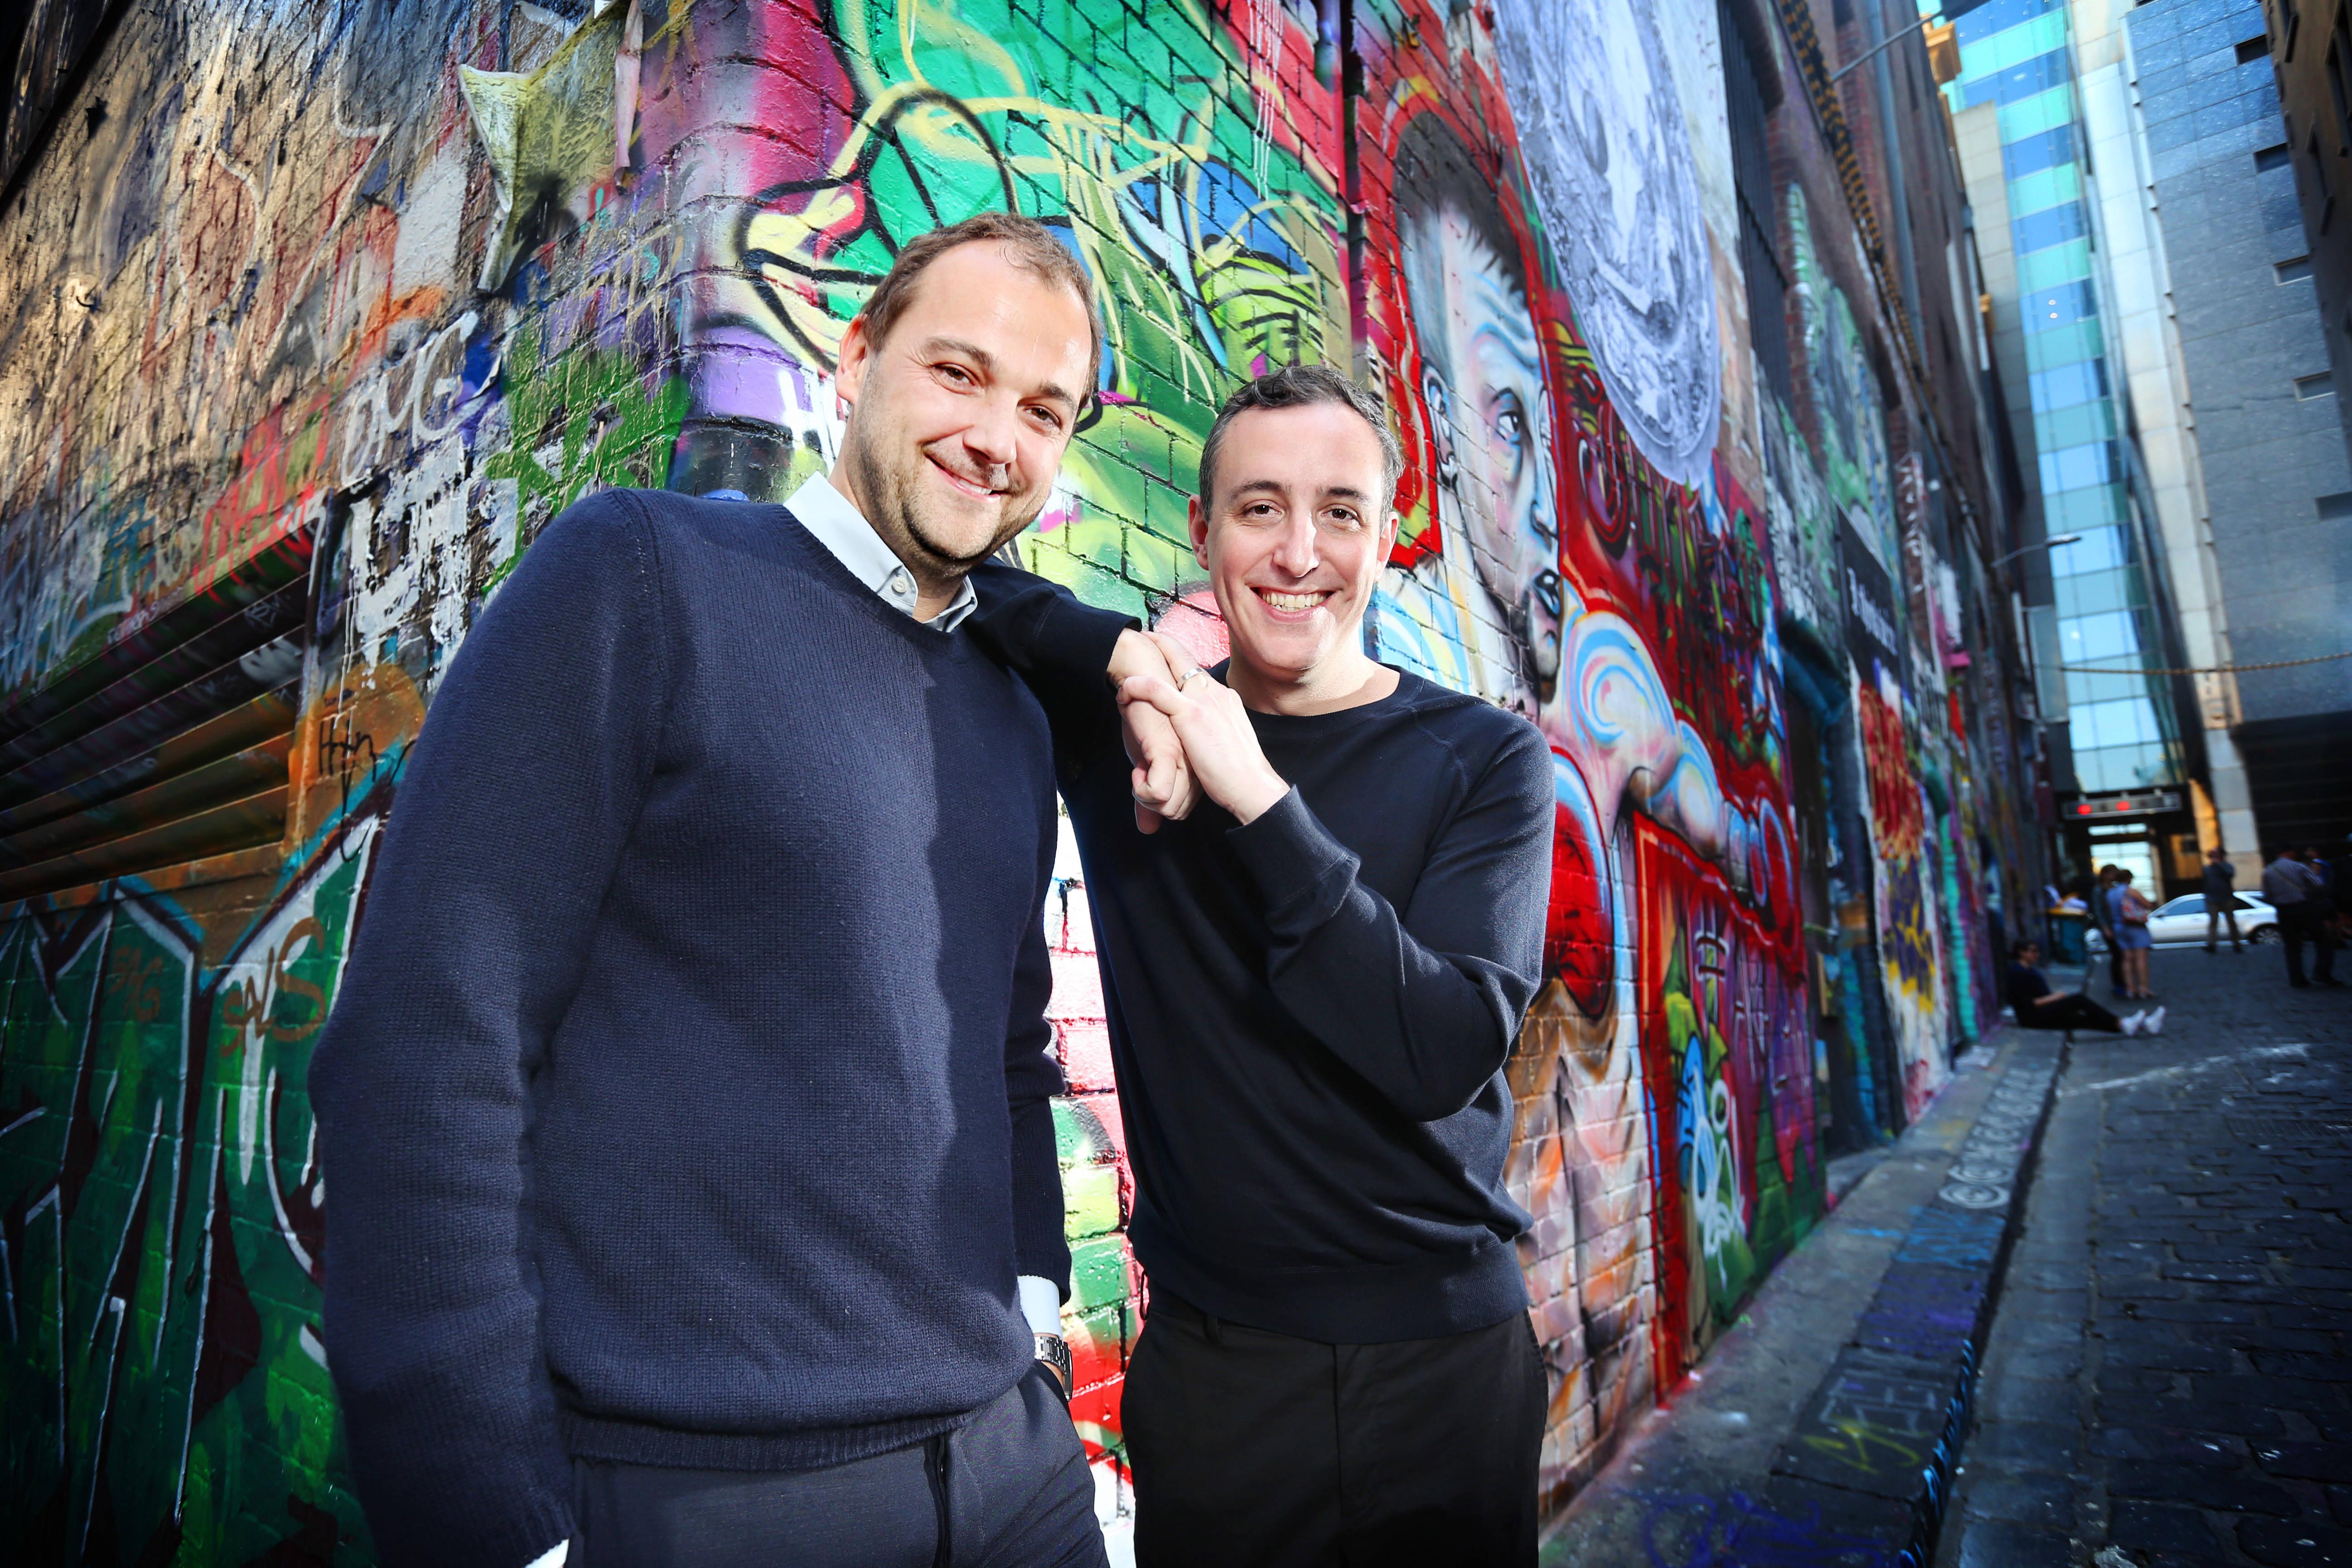 Daniel Humm & Will Guidara post in front of graffiti during a photo shoot